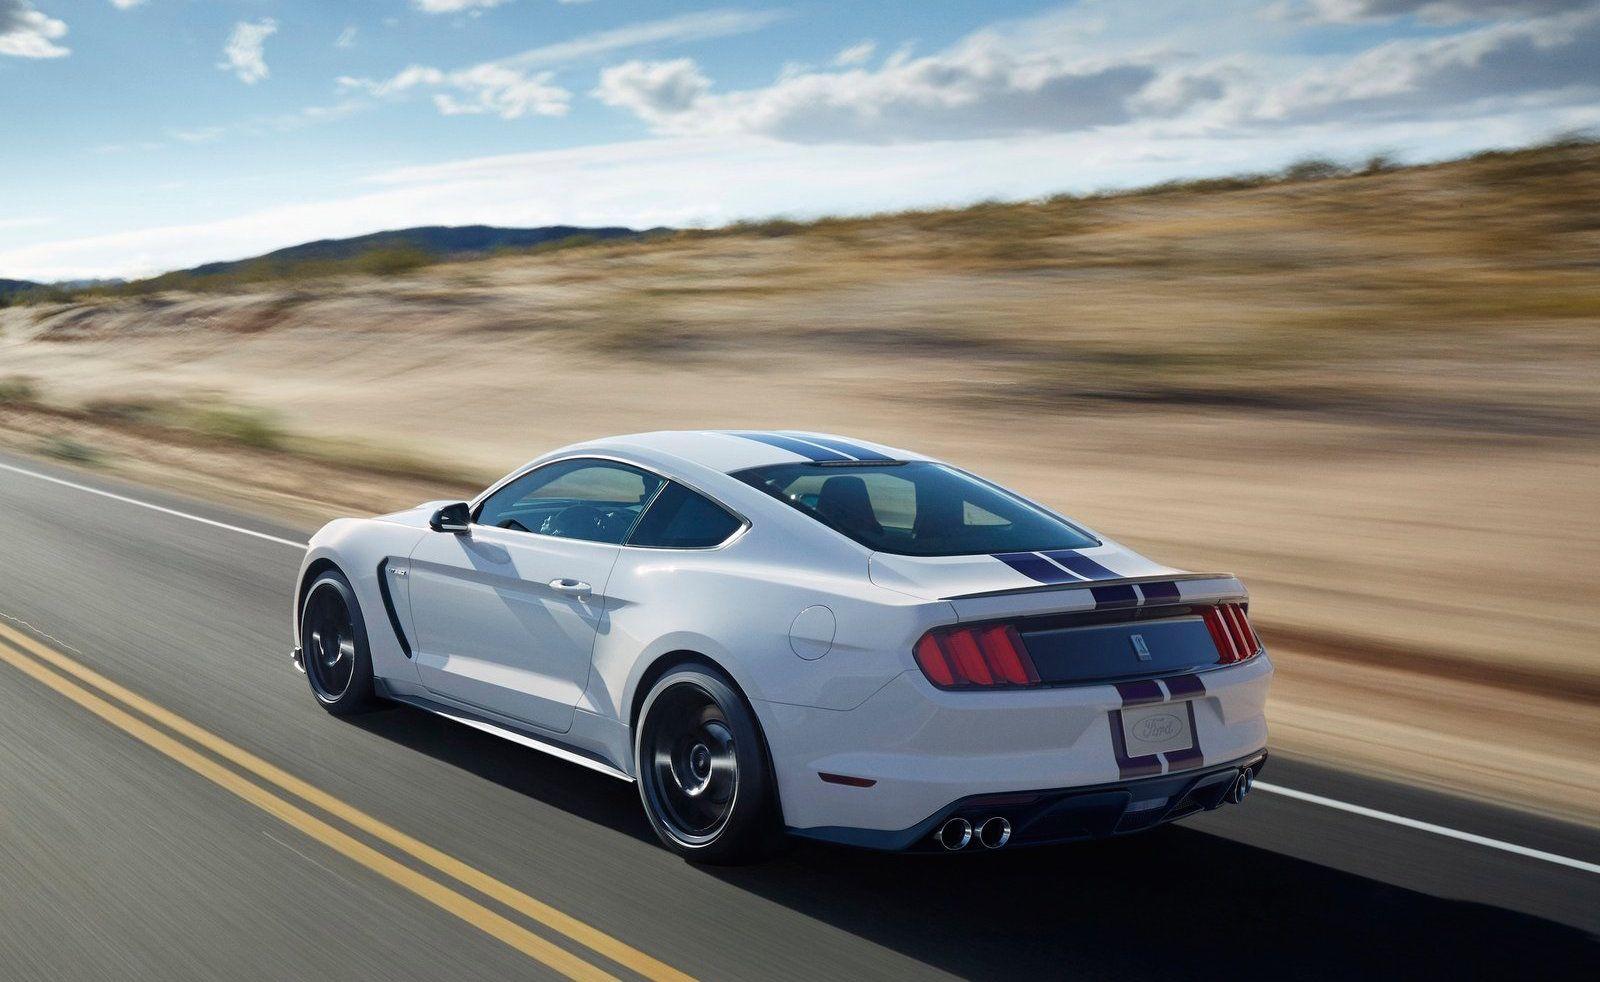 Best Sounding New Cars Under 100 000 Great Sounding Cars Under 100k